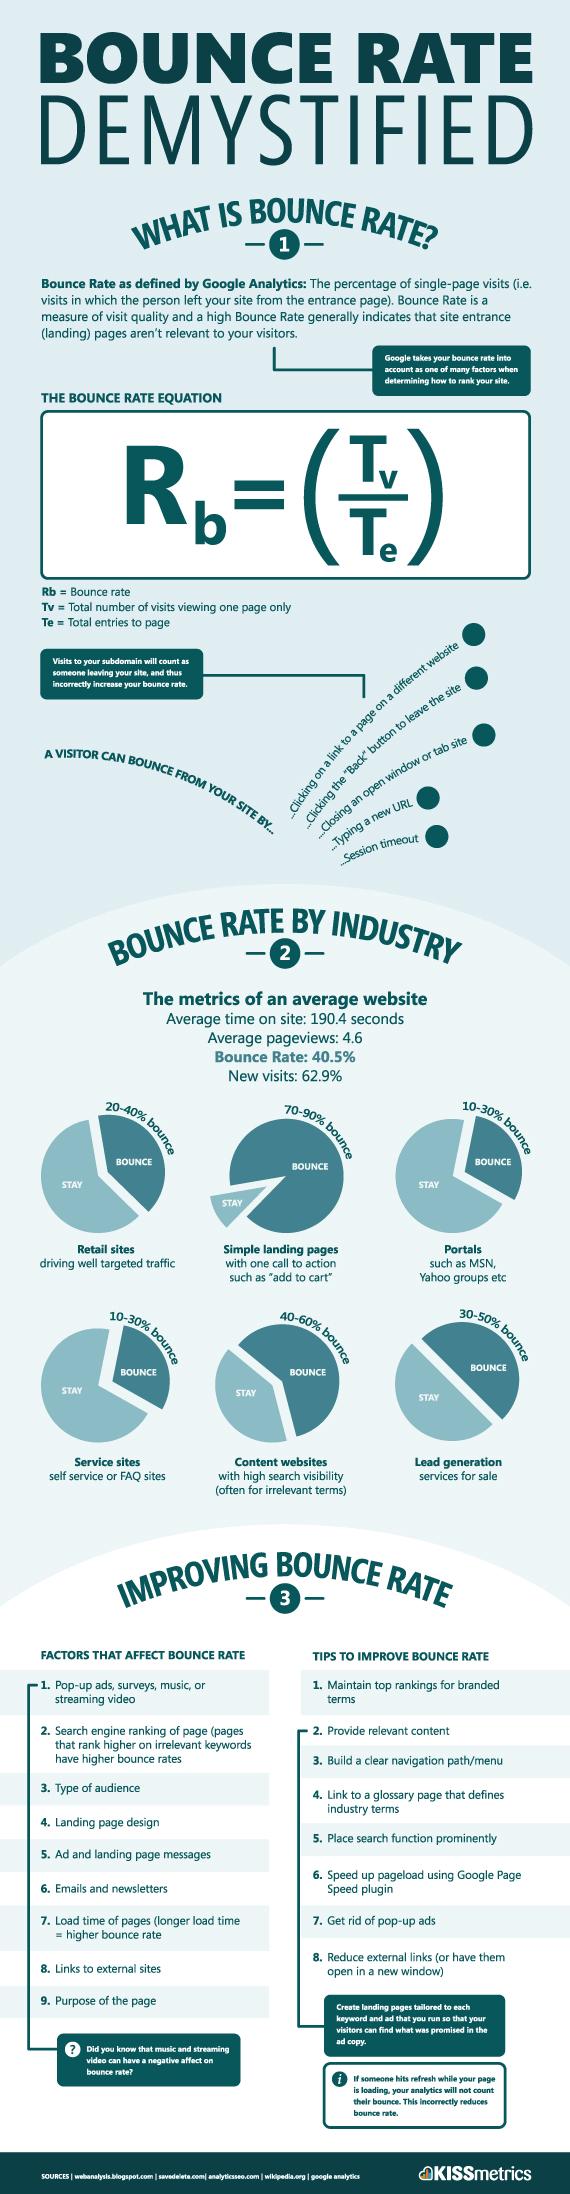 kissmetrics-bounce-rate-infographic